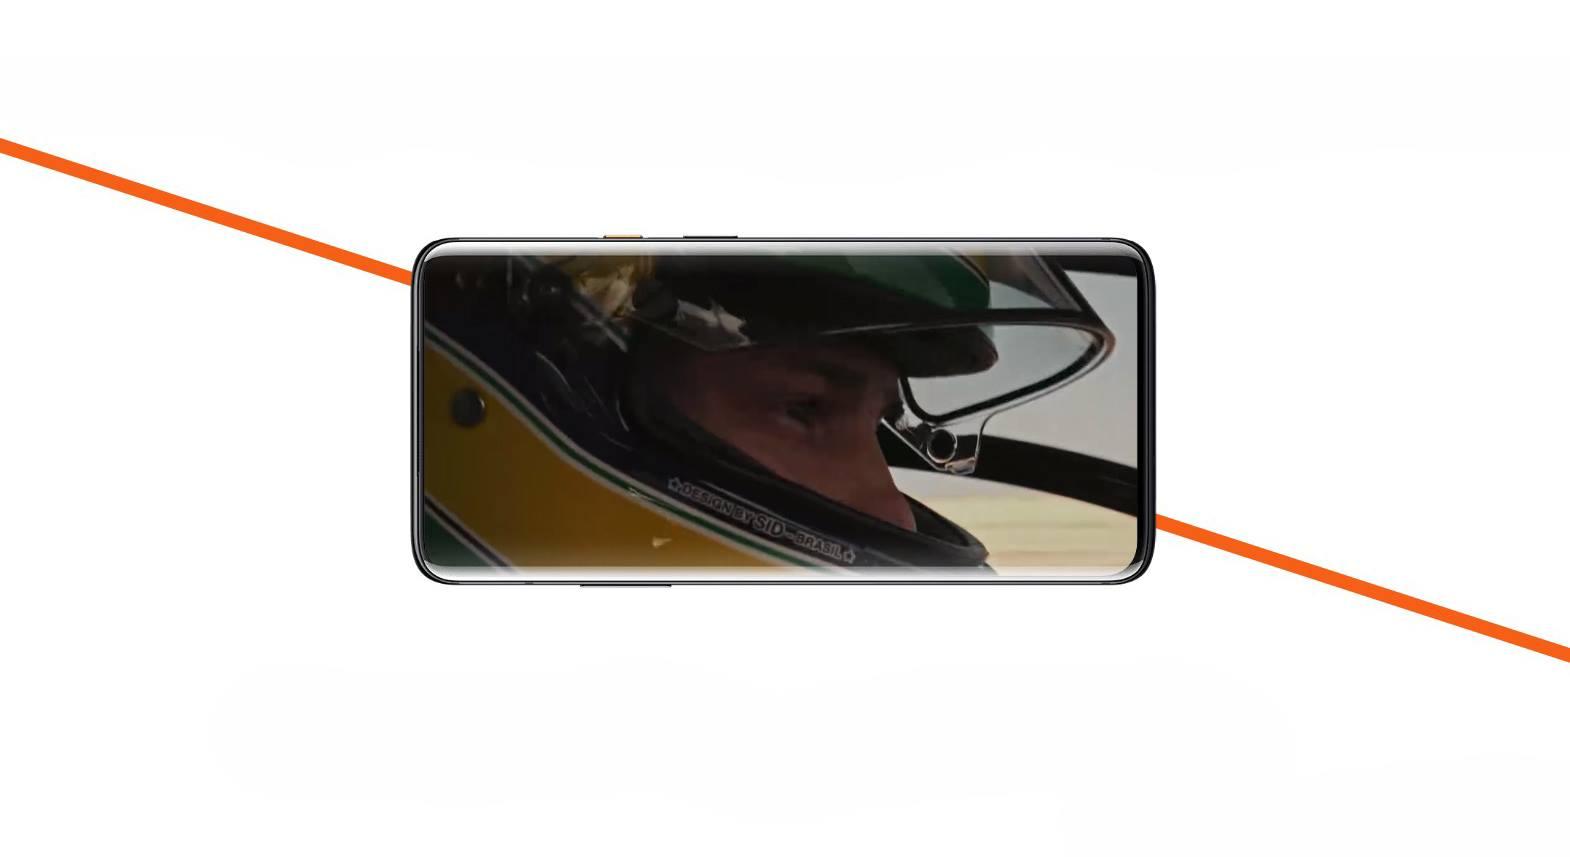 OnePlus 7T Pro 5G McLaren (2)